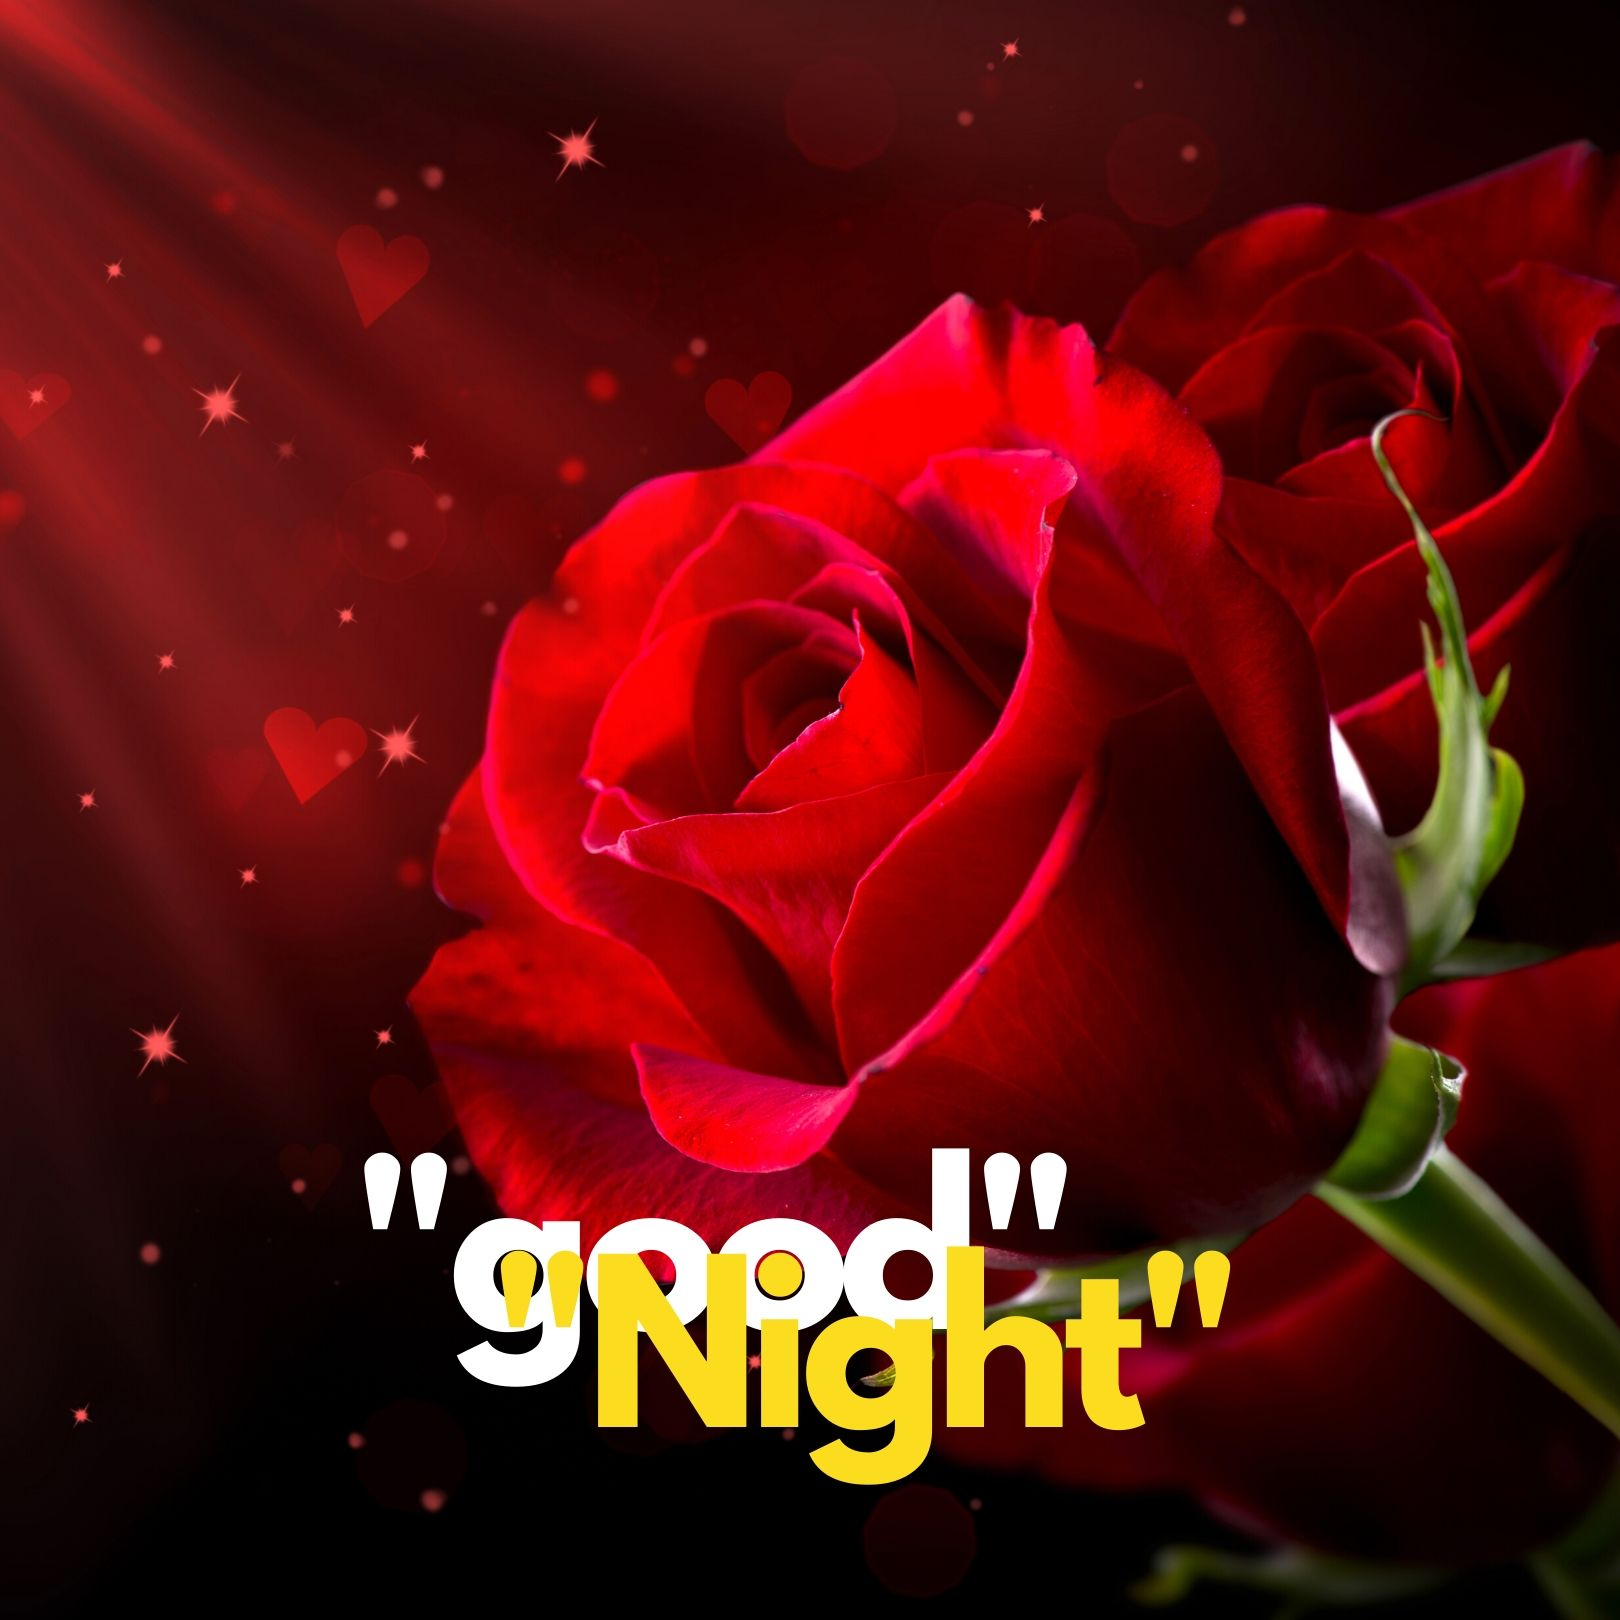 Good Night rose pic hd full HD free download.